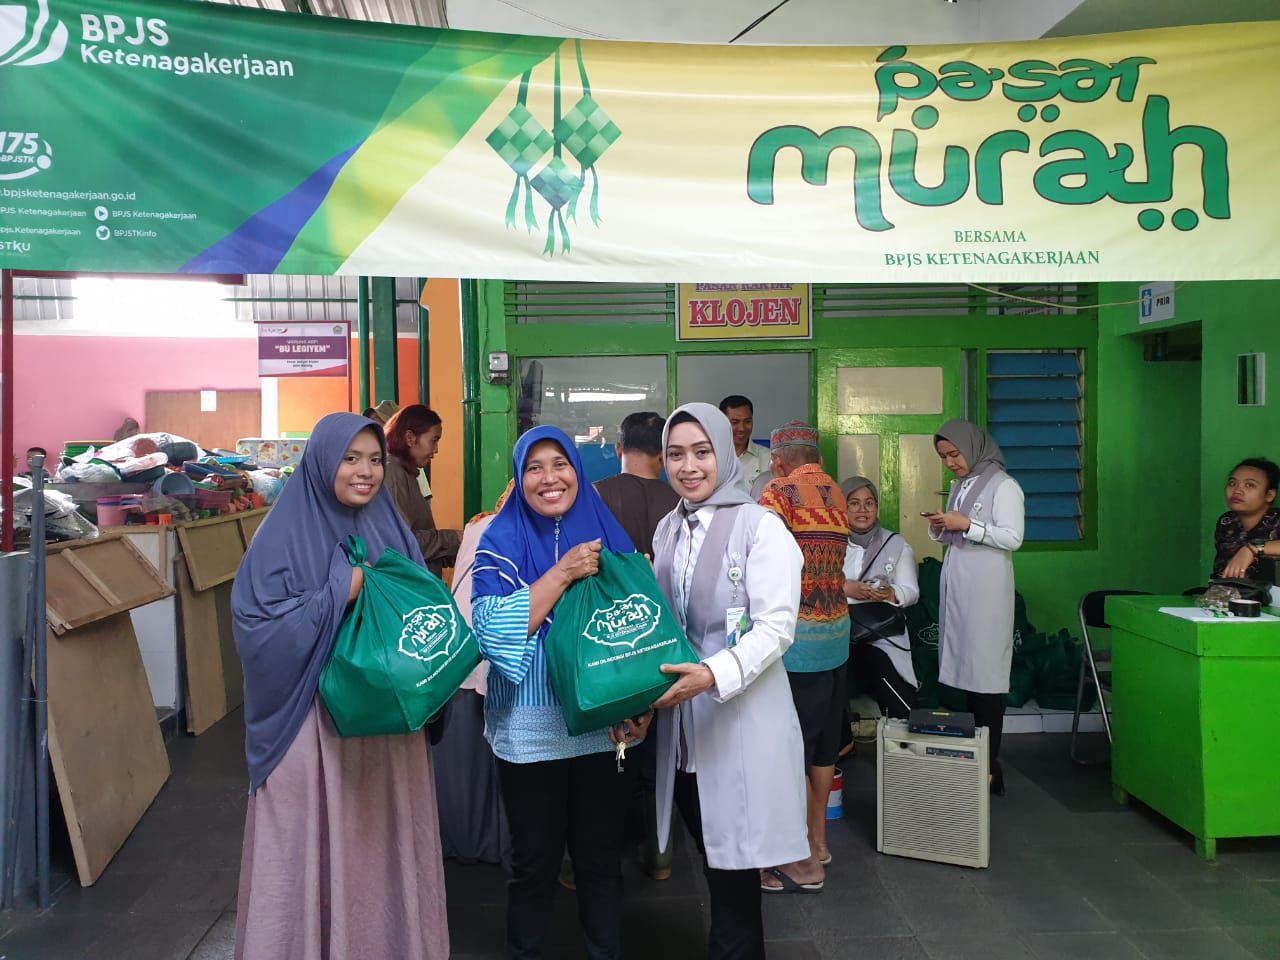 BPJS Ketenagakerjaan Jual Sembako Murah di Pasar Klojen Malang